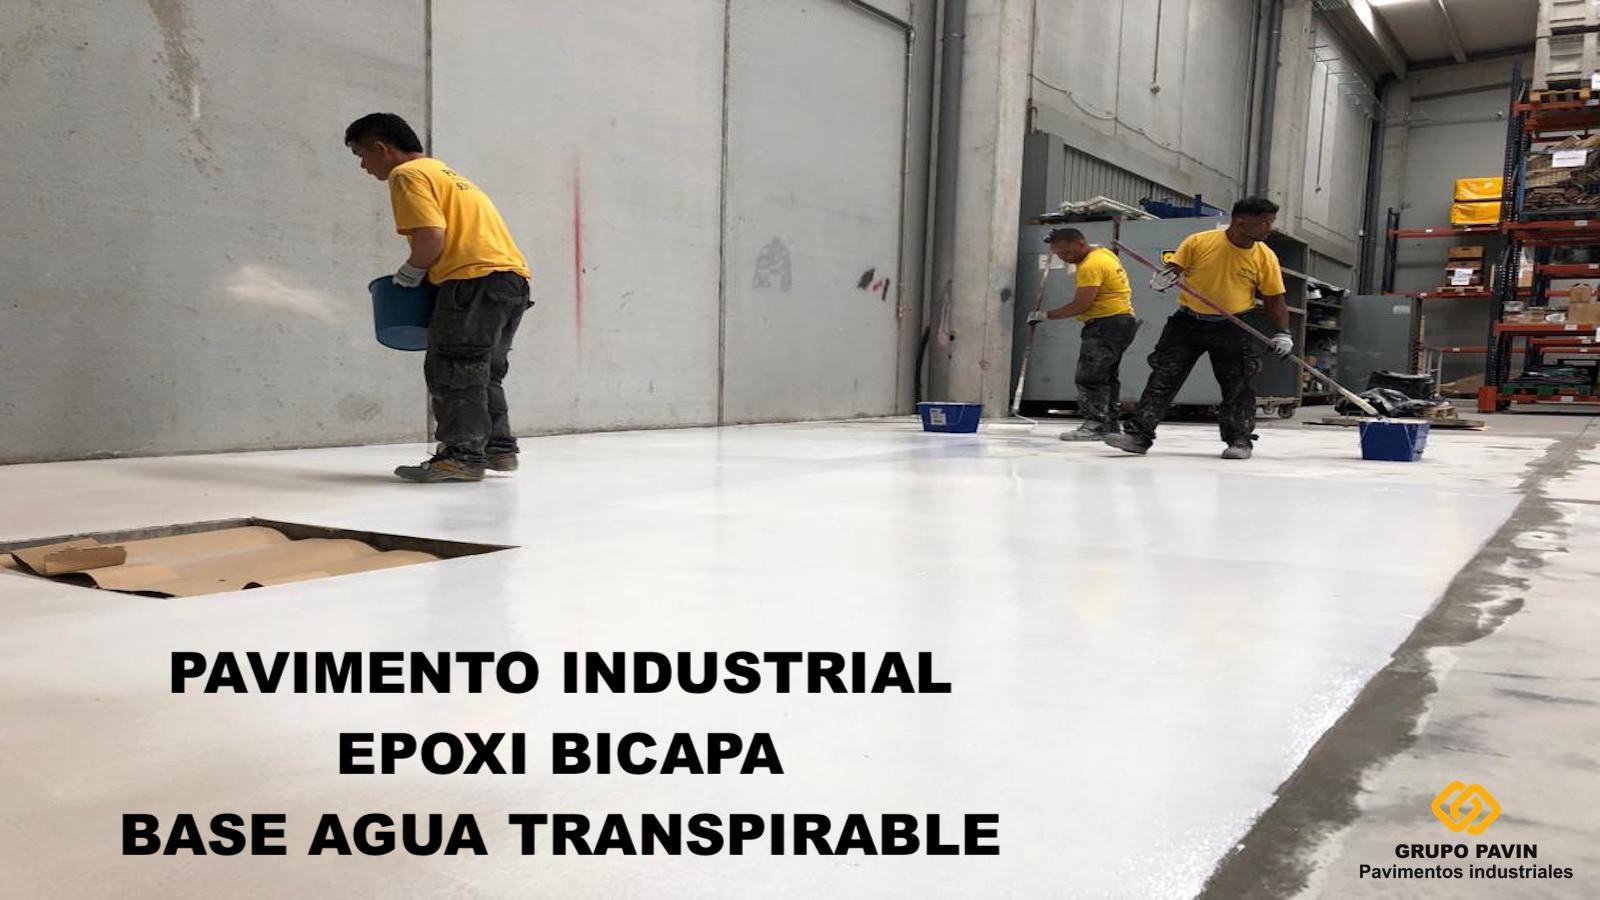 Pavimento industrial epoxi bicapa base agua transpirable